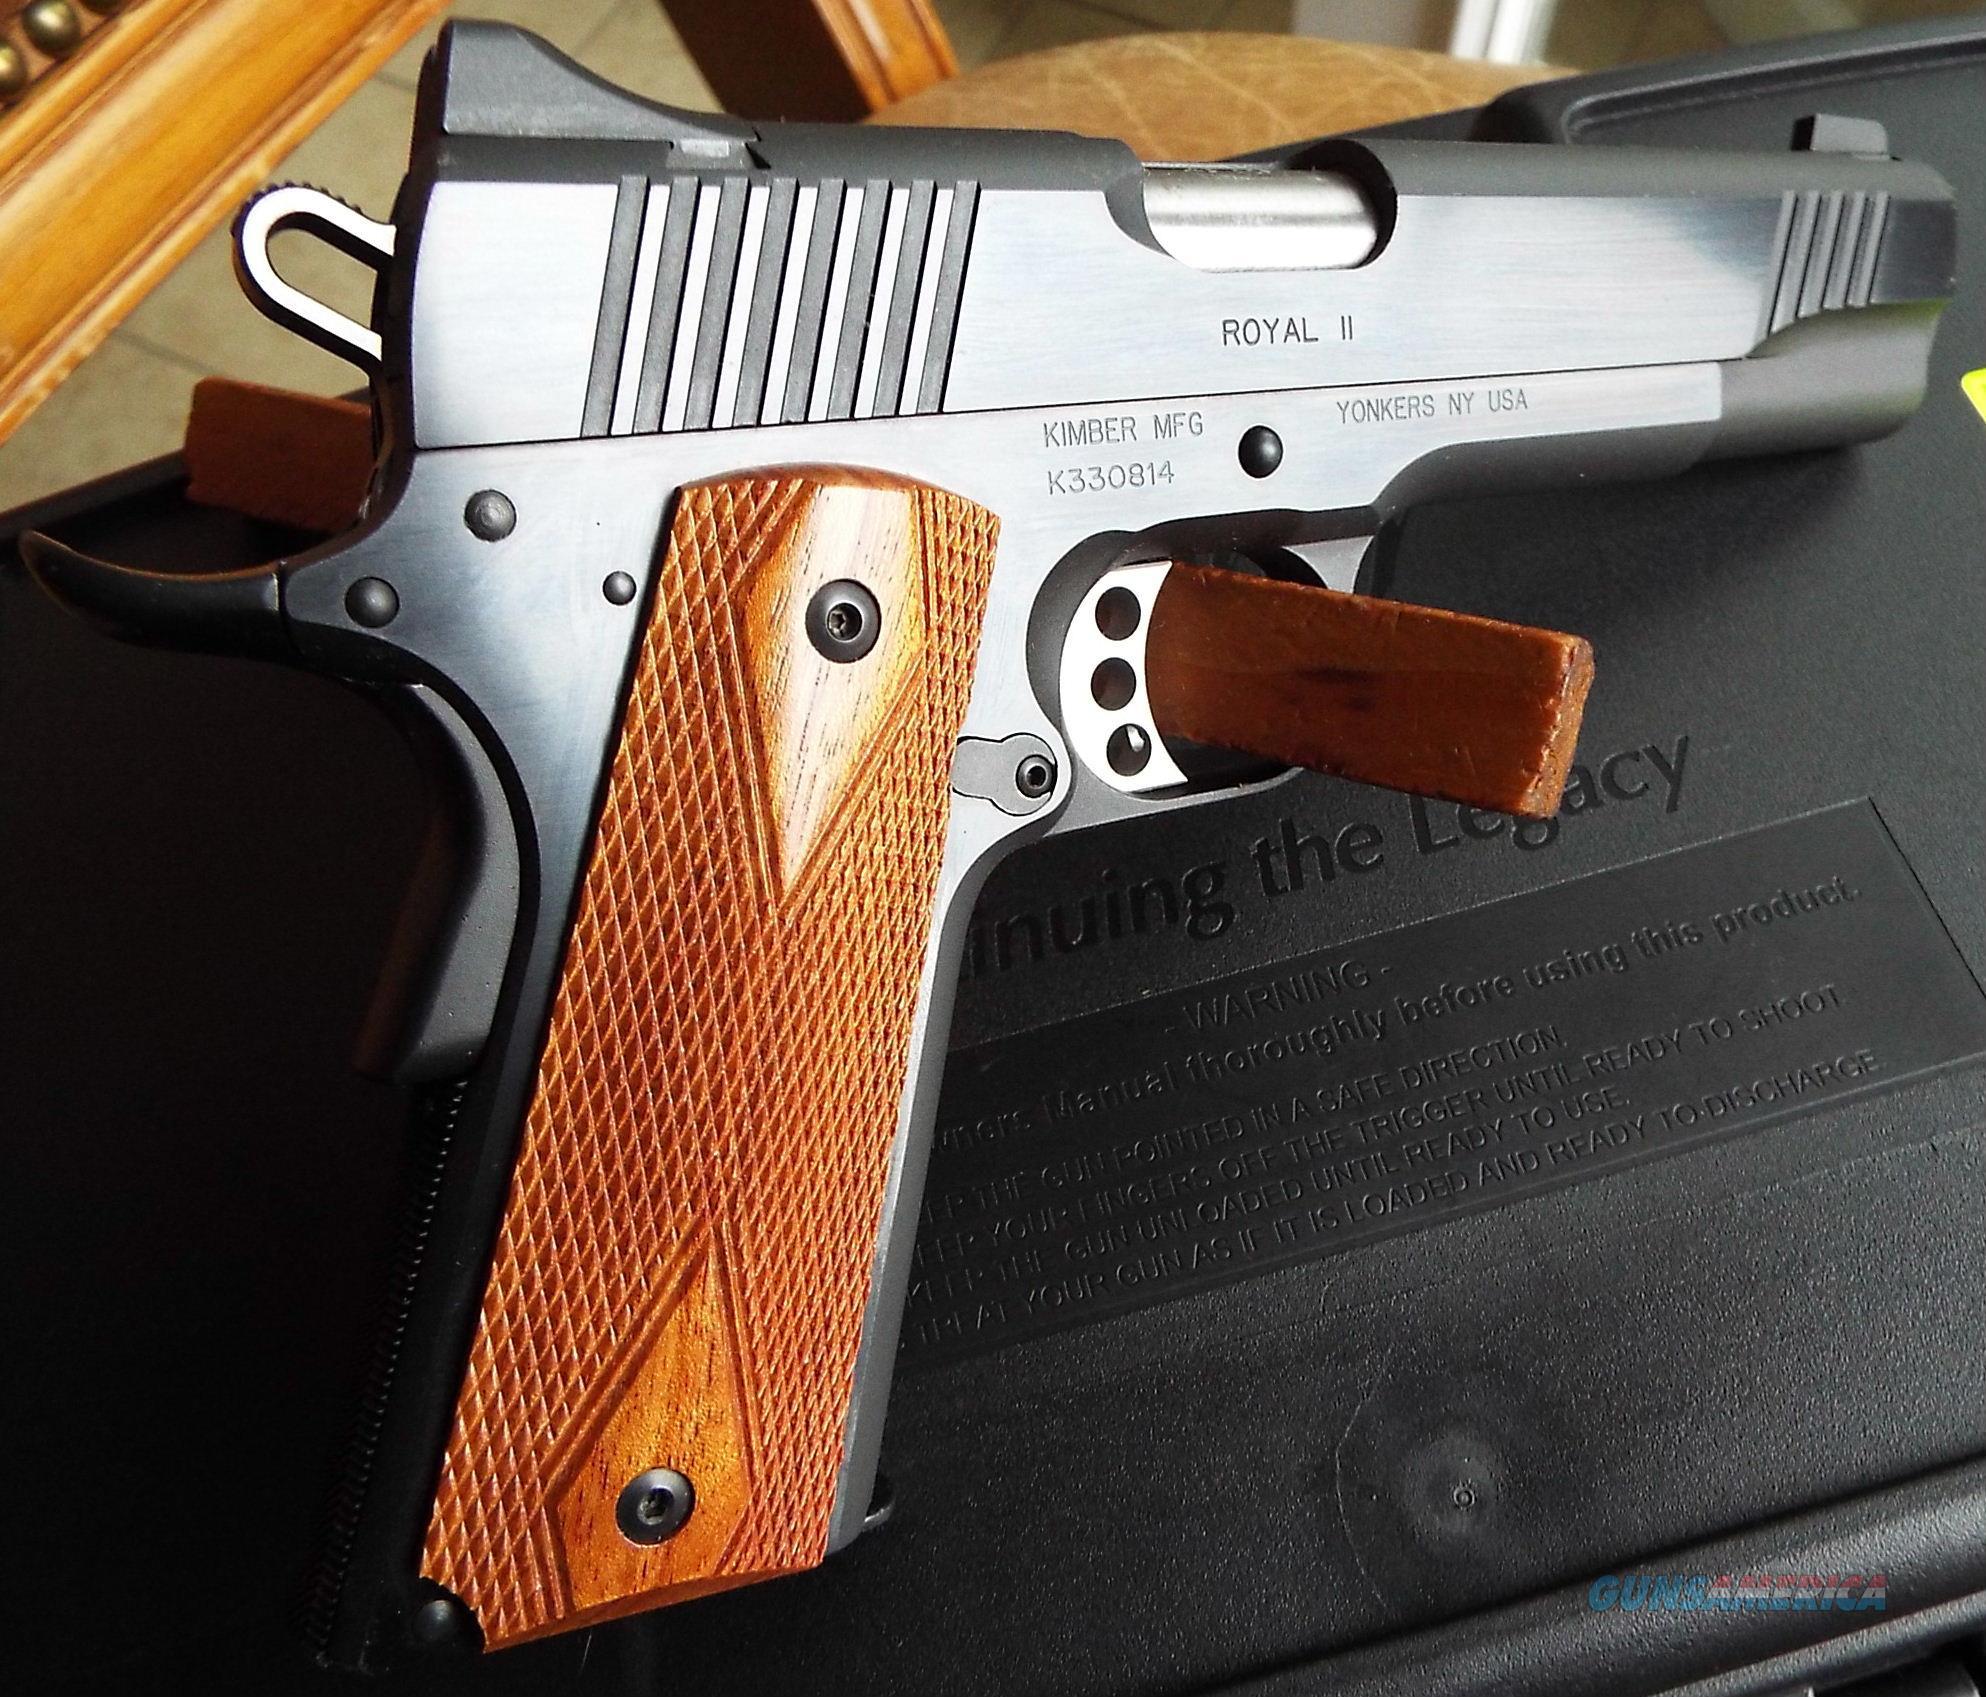 Kimber ROYAL II  1911 45 ACP  Like New!  LAYAWAY OPTION  320052  Guns > Pistols > Kimber of America Pistols > 1911